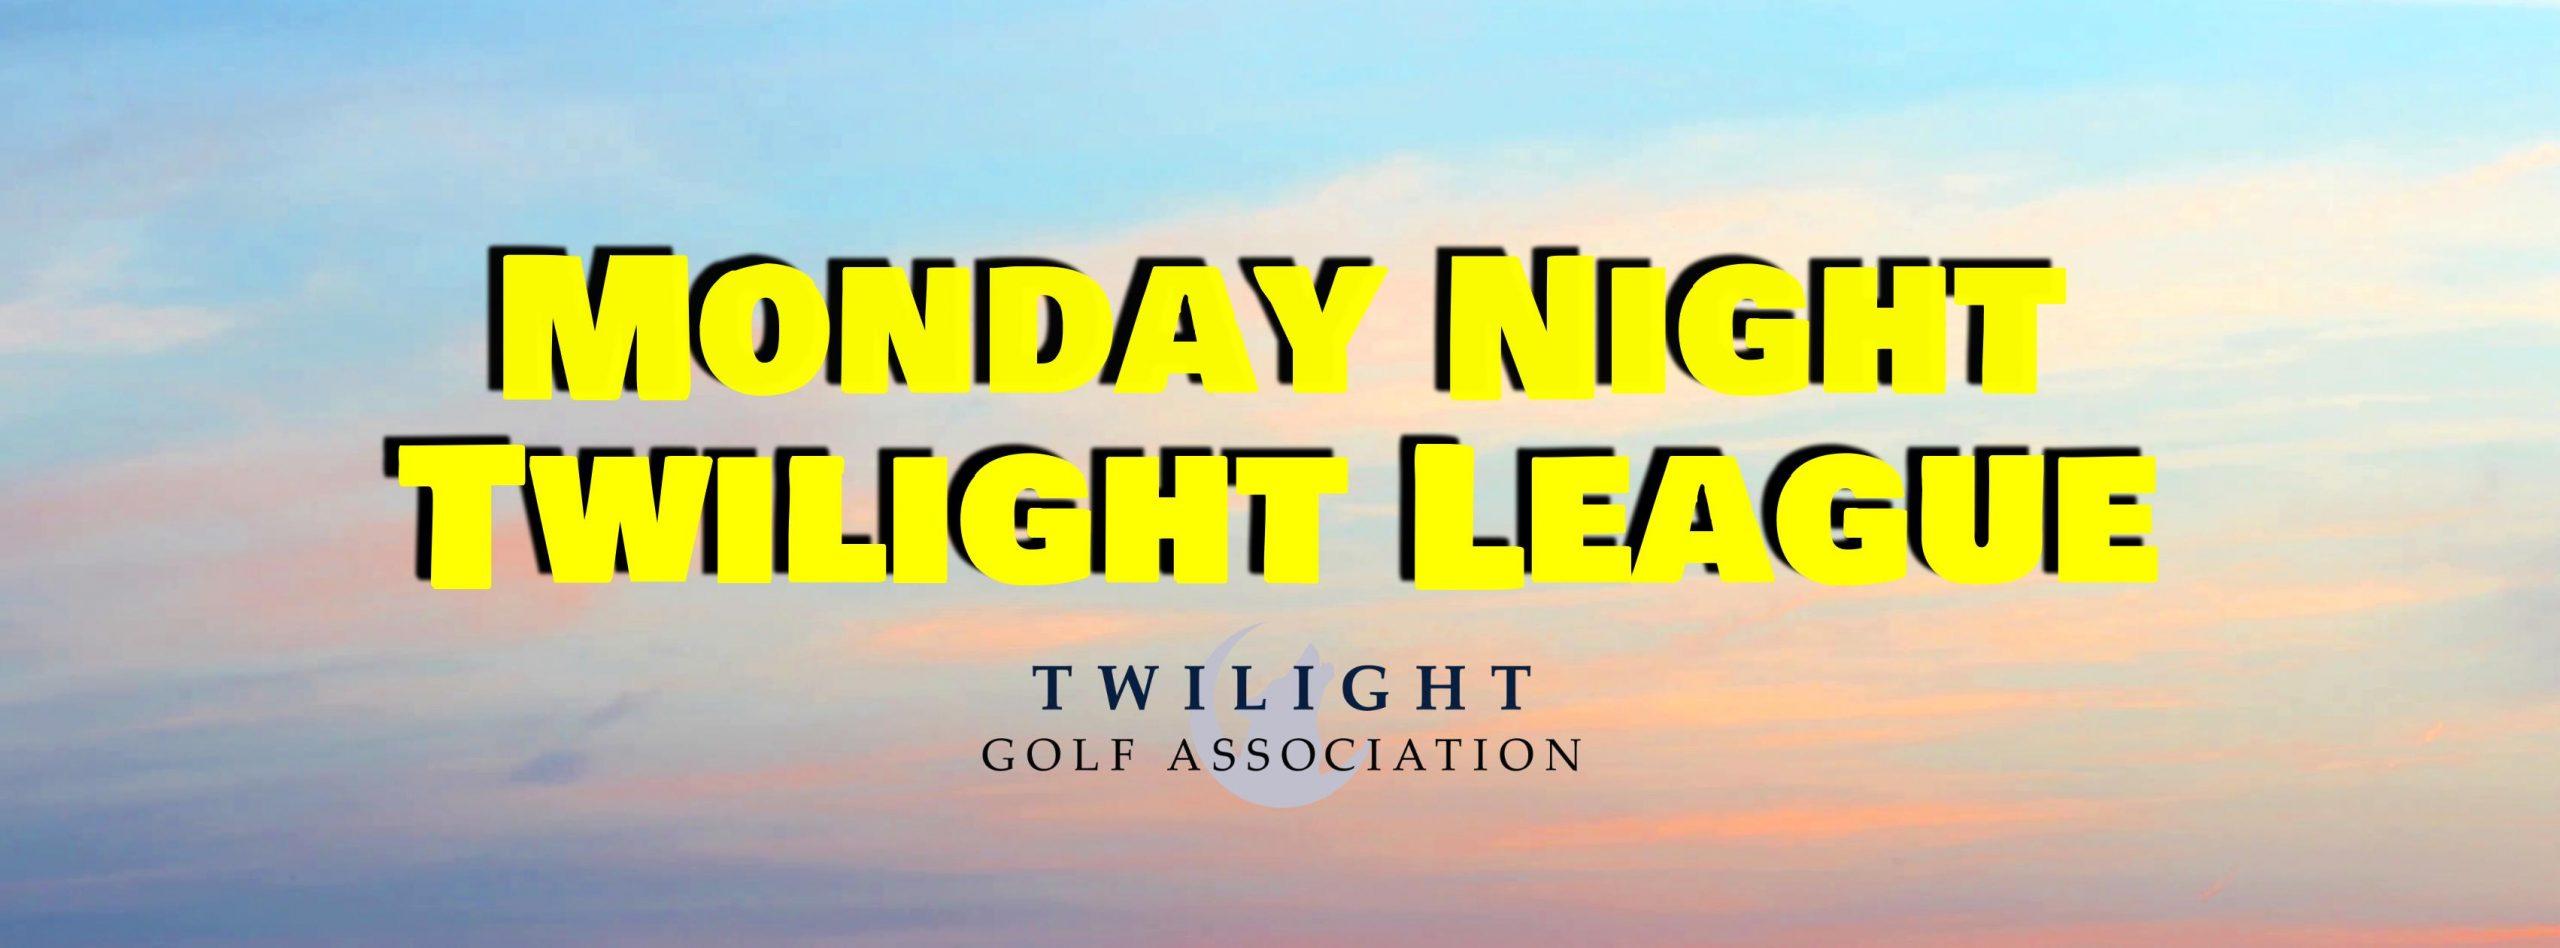 Monday Night Twilight League at Bey Lea Golf Course